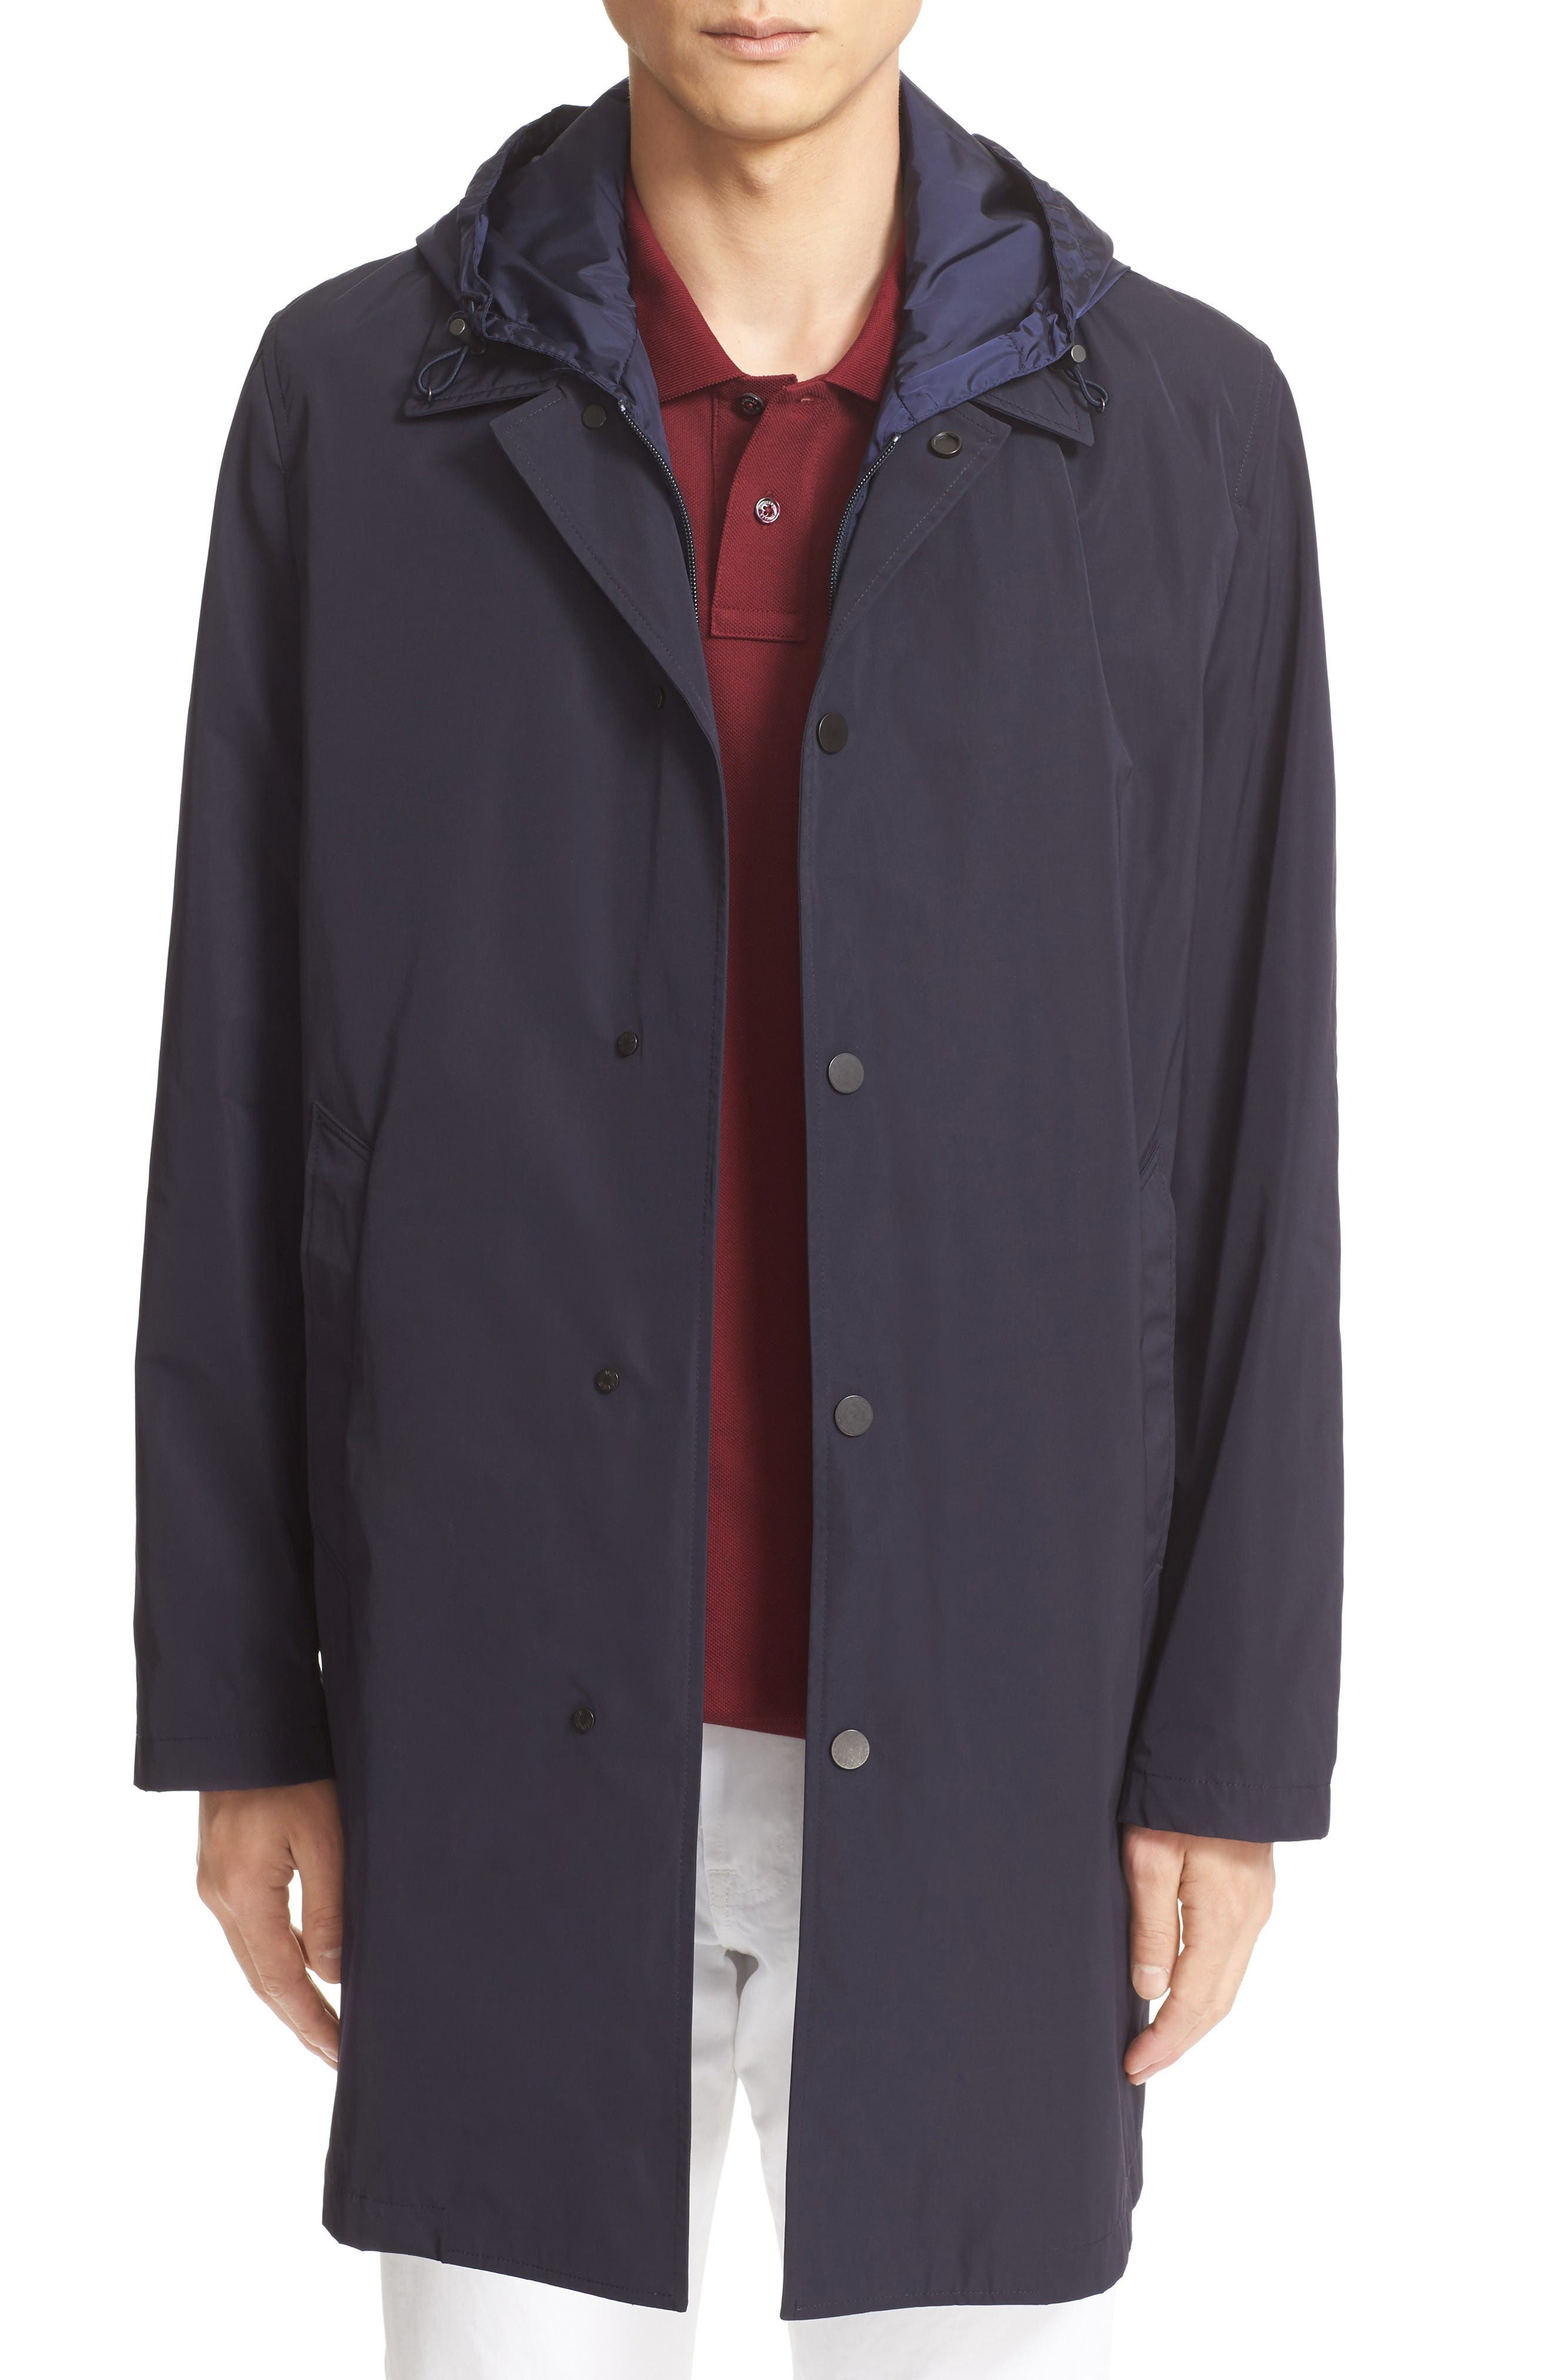 MONCLER Reynaud Hooded Bib Inset Raincoat